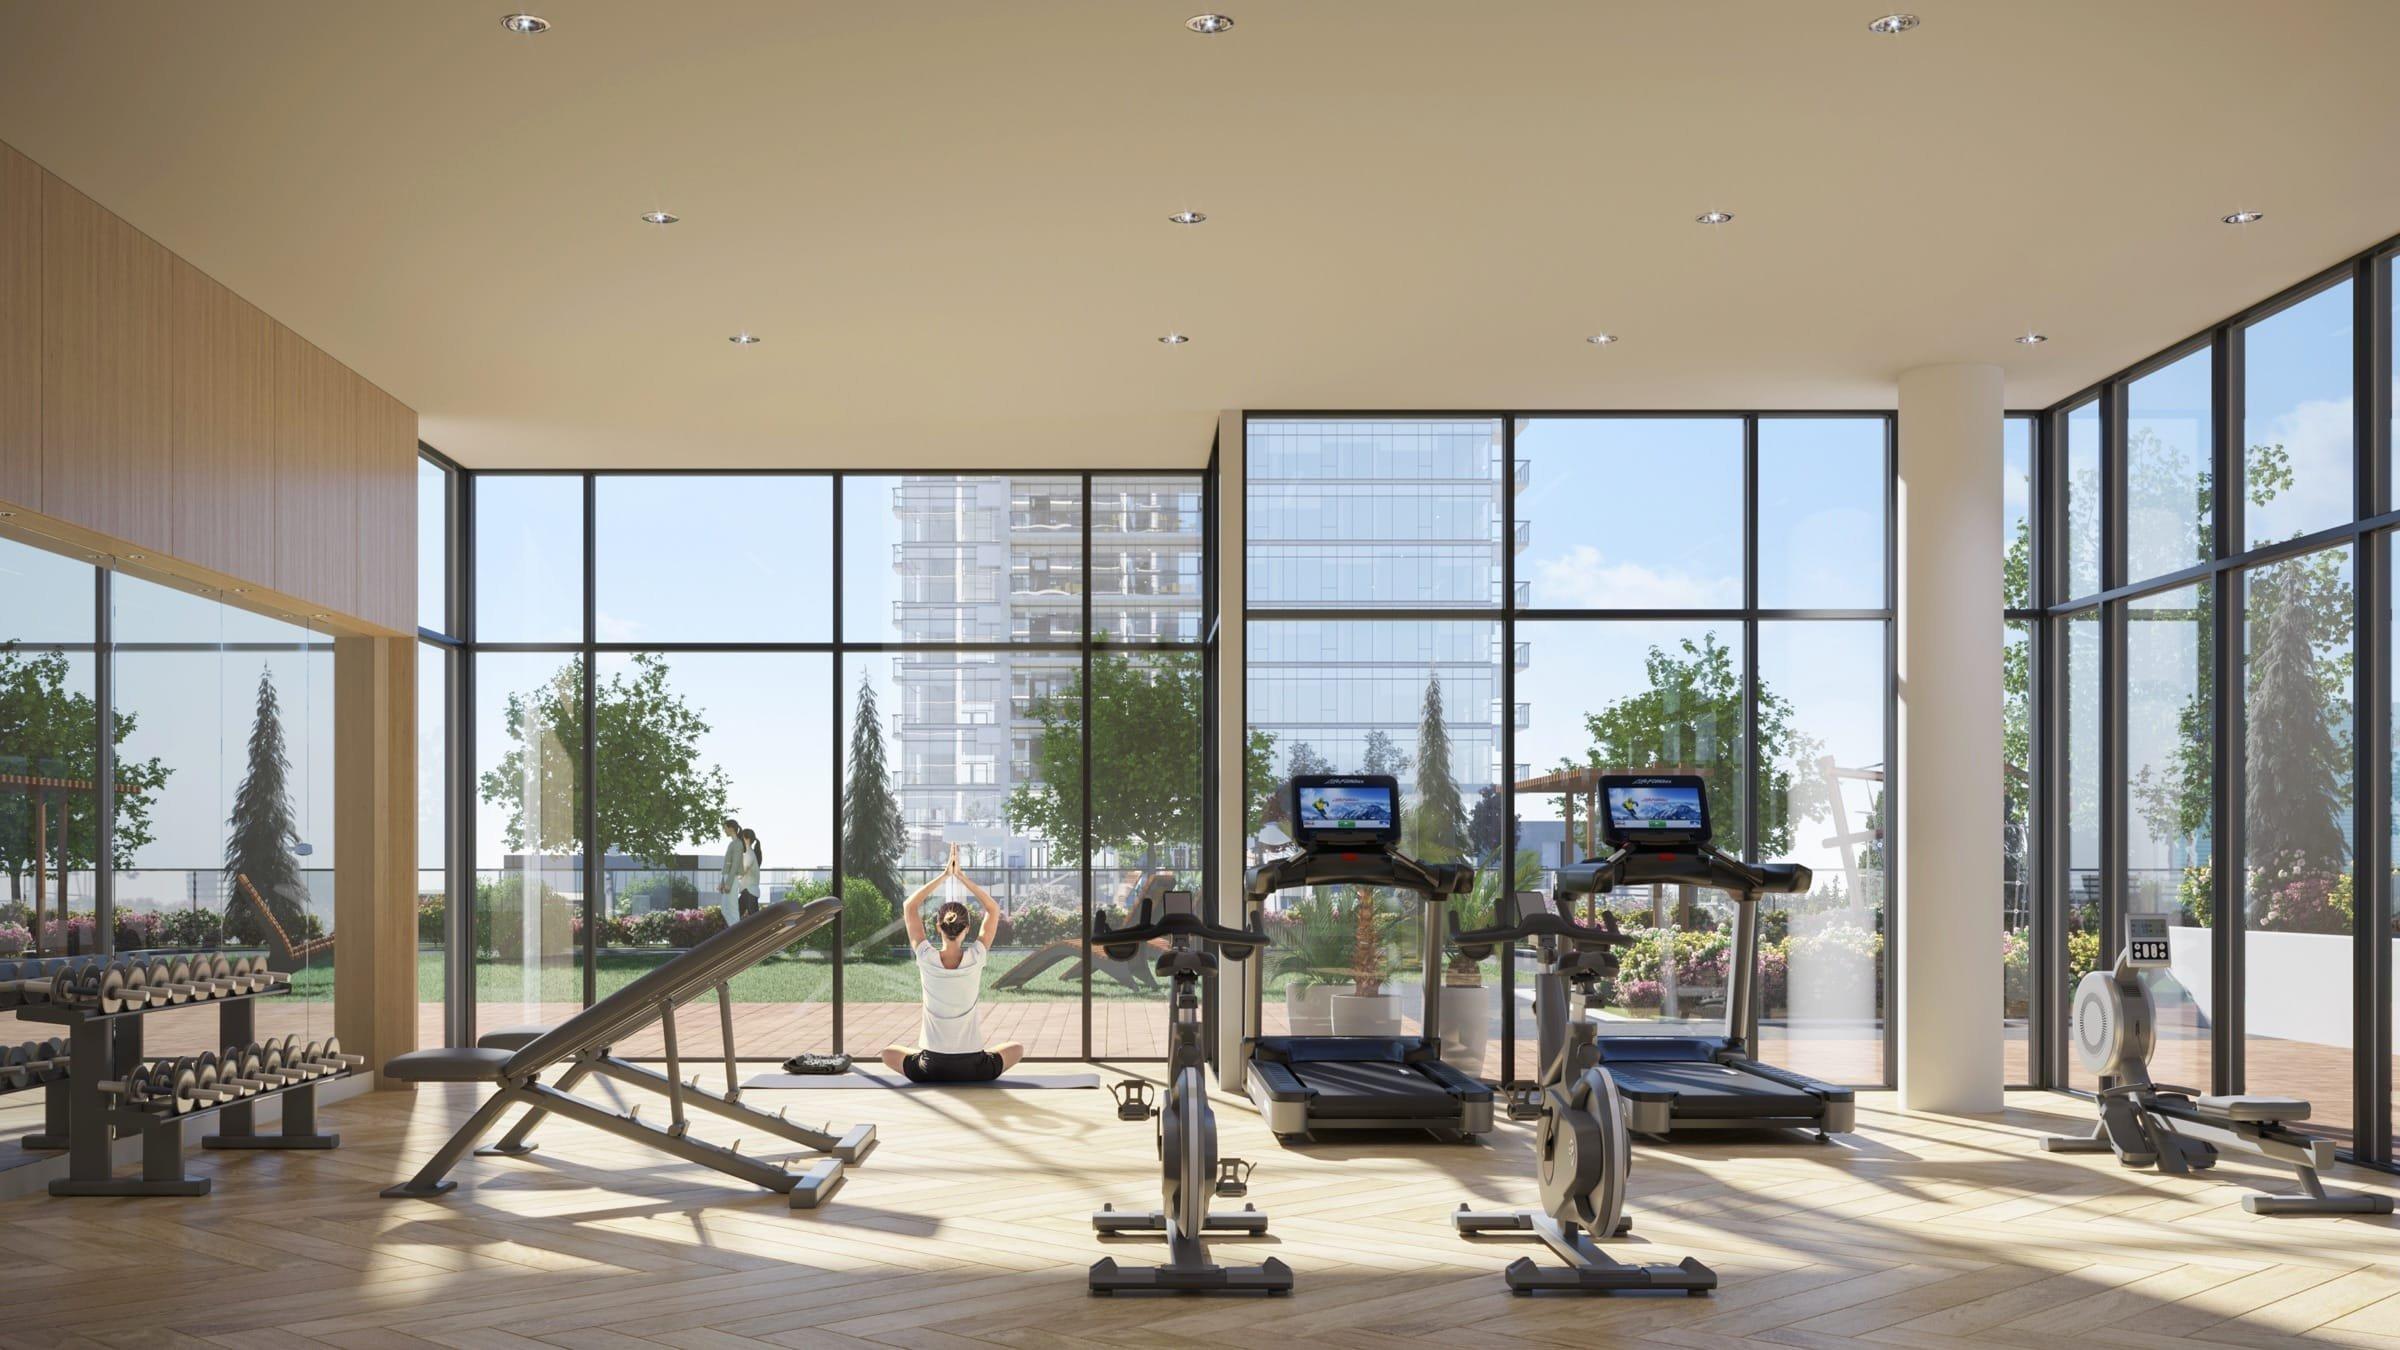 Exercise Centre - 1033 Austin Ave, Coquitlam, BC V3K 3P2, Canada!